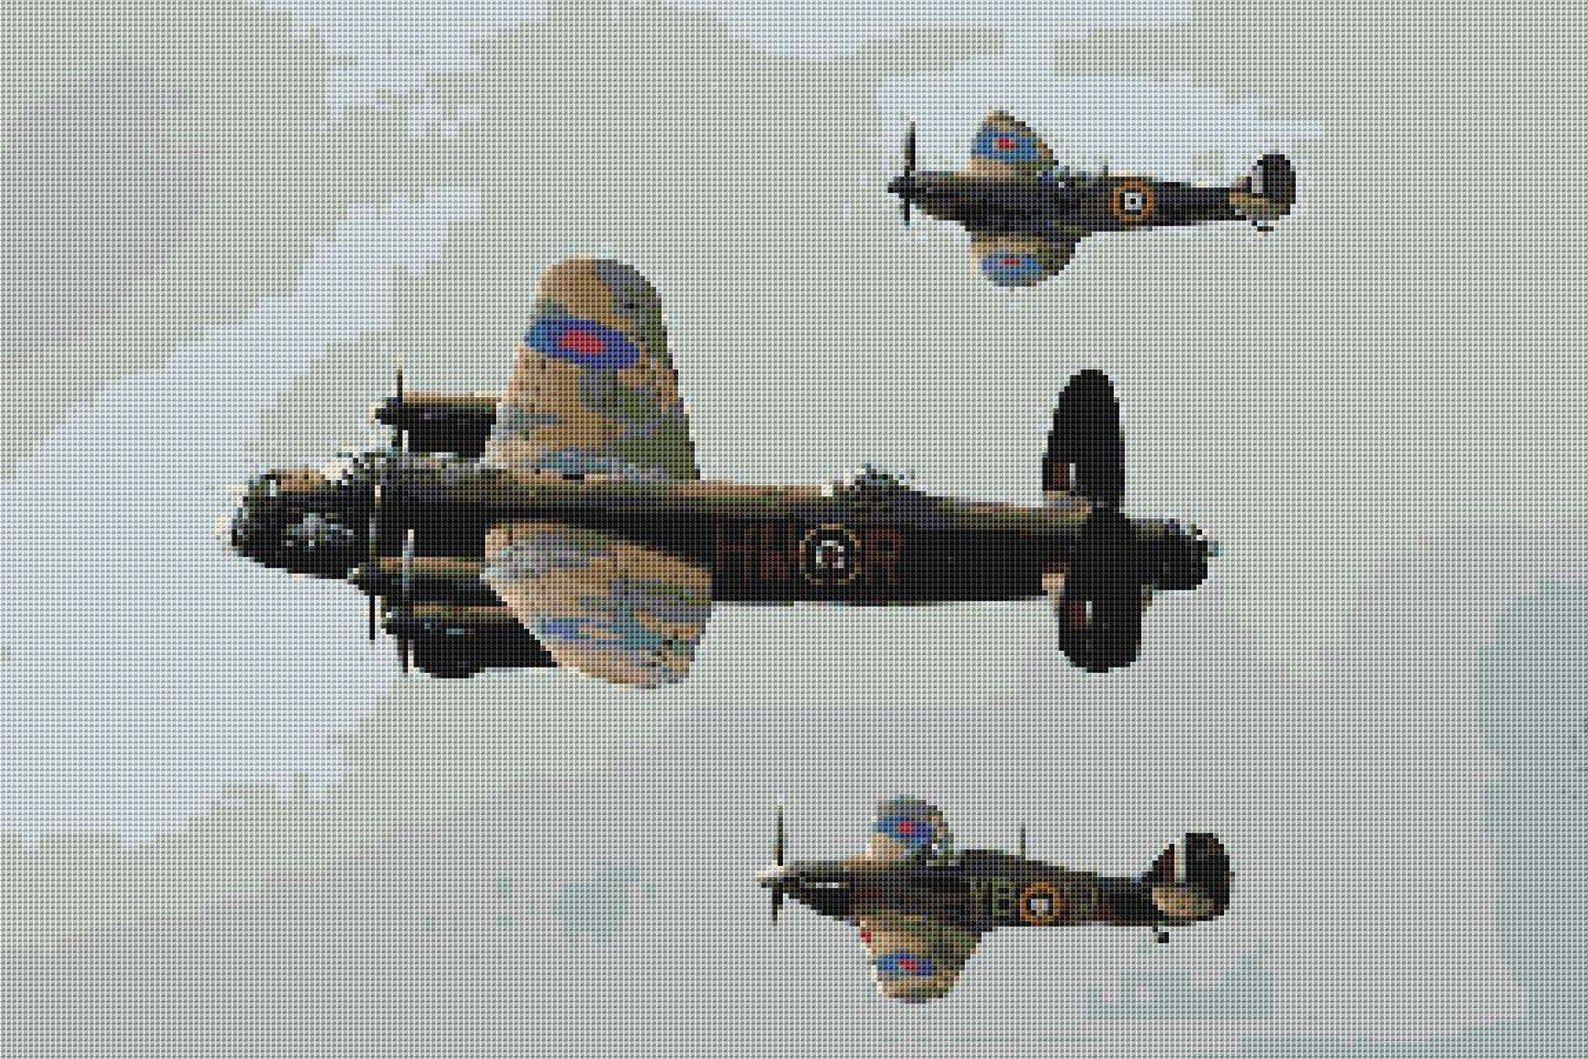 Battle of Britain Cross Stitch